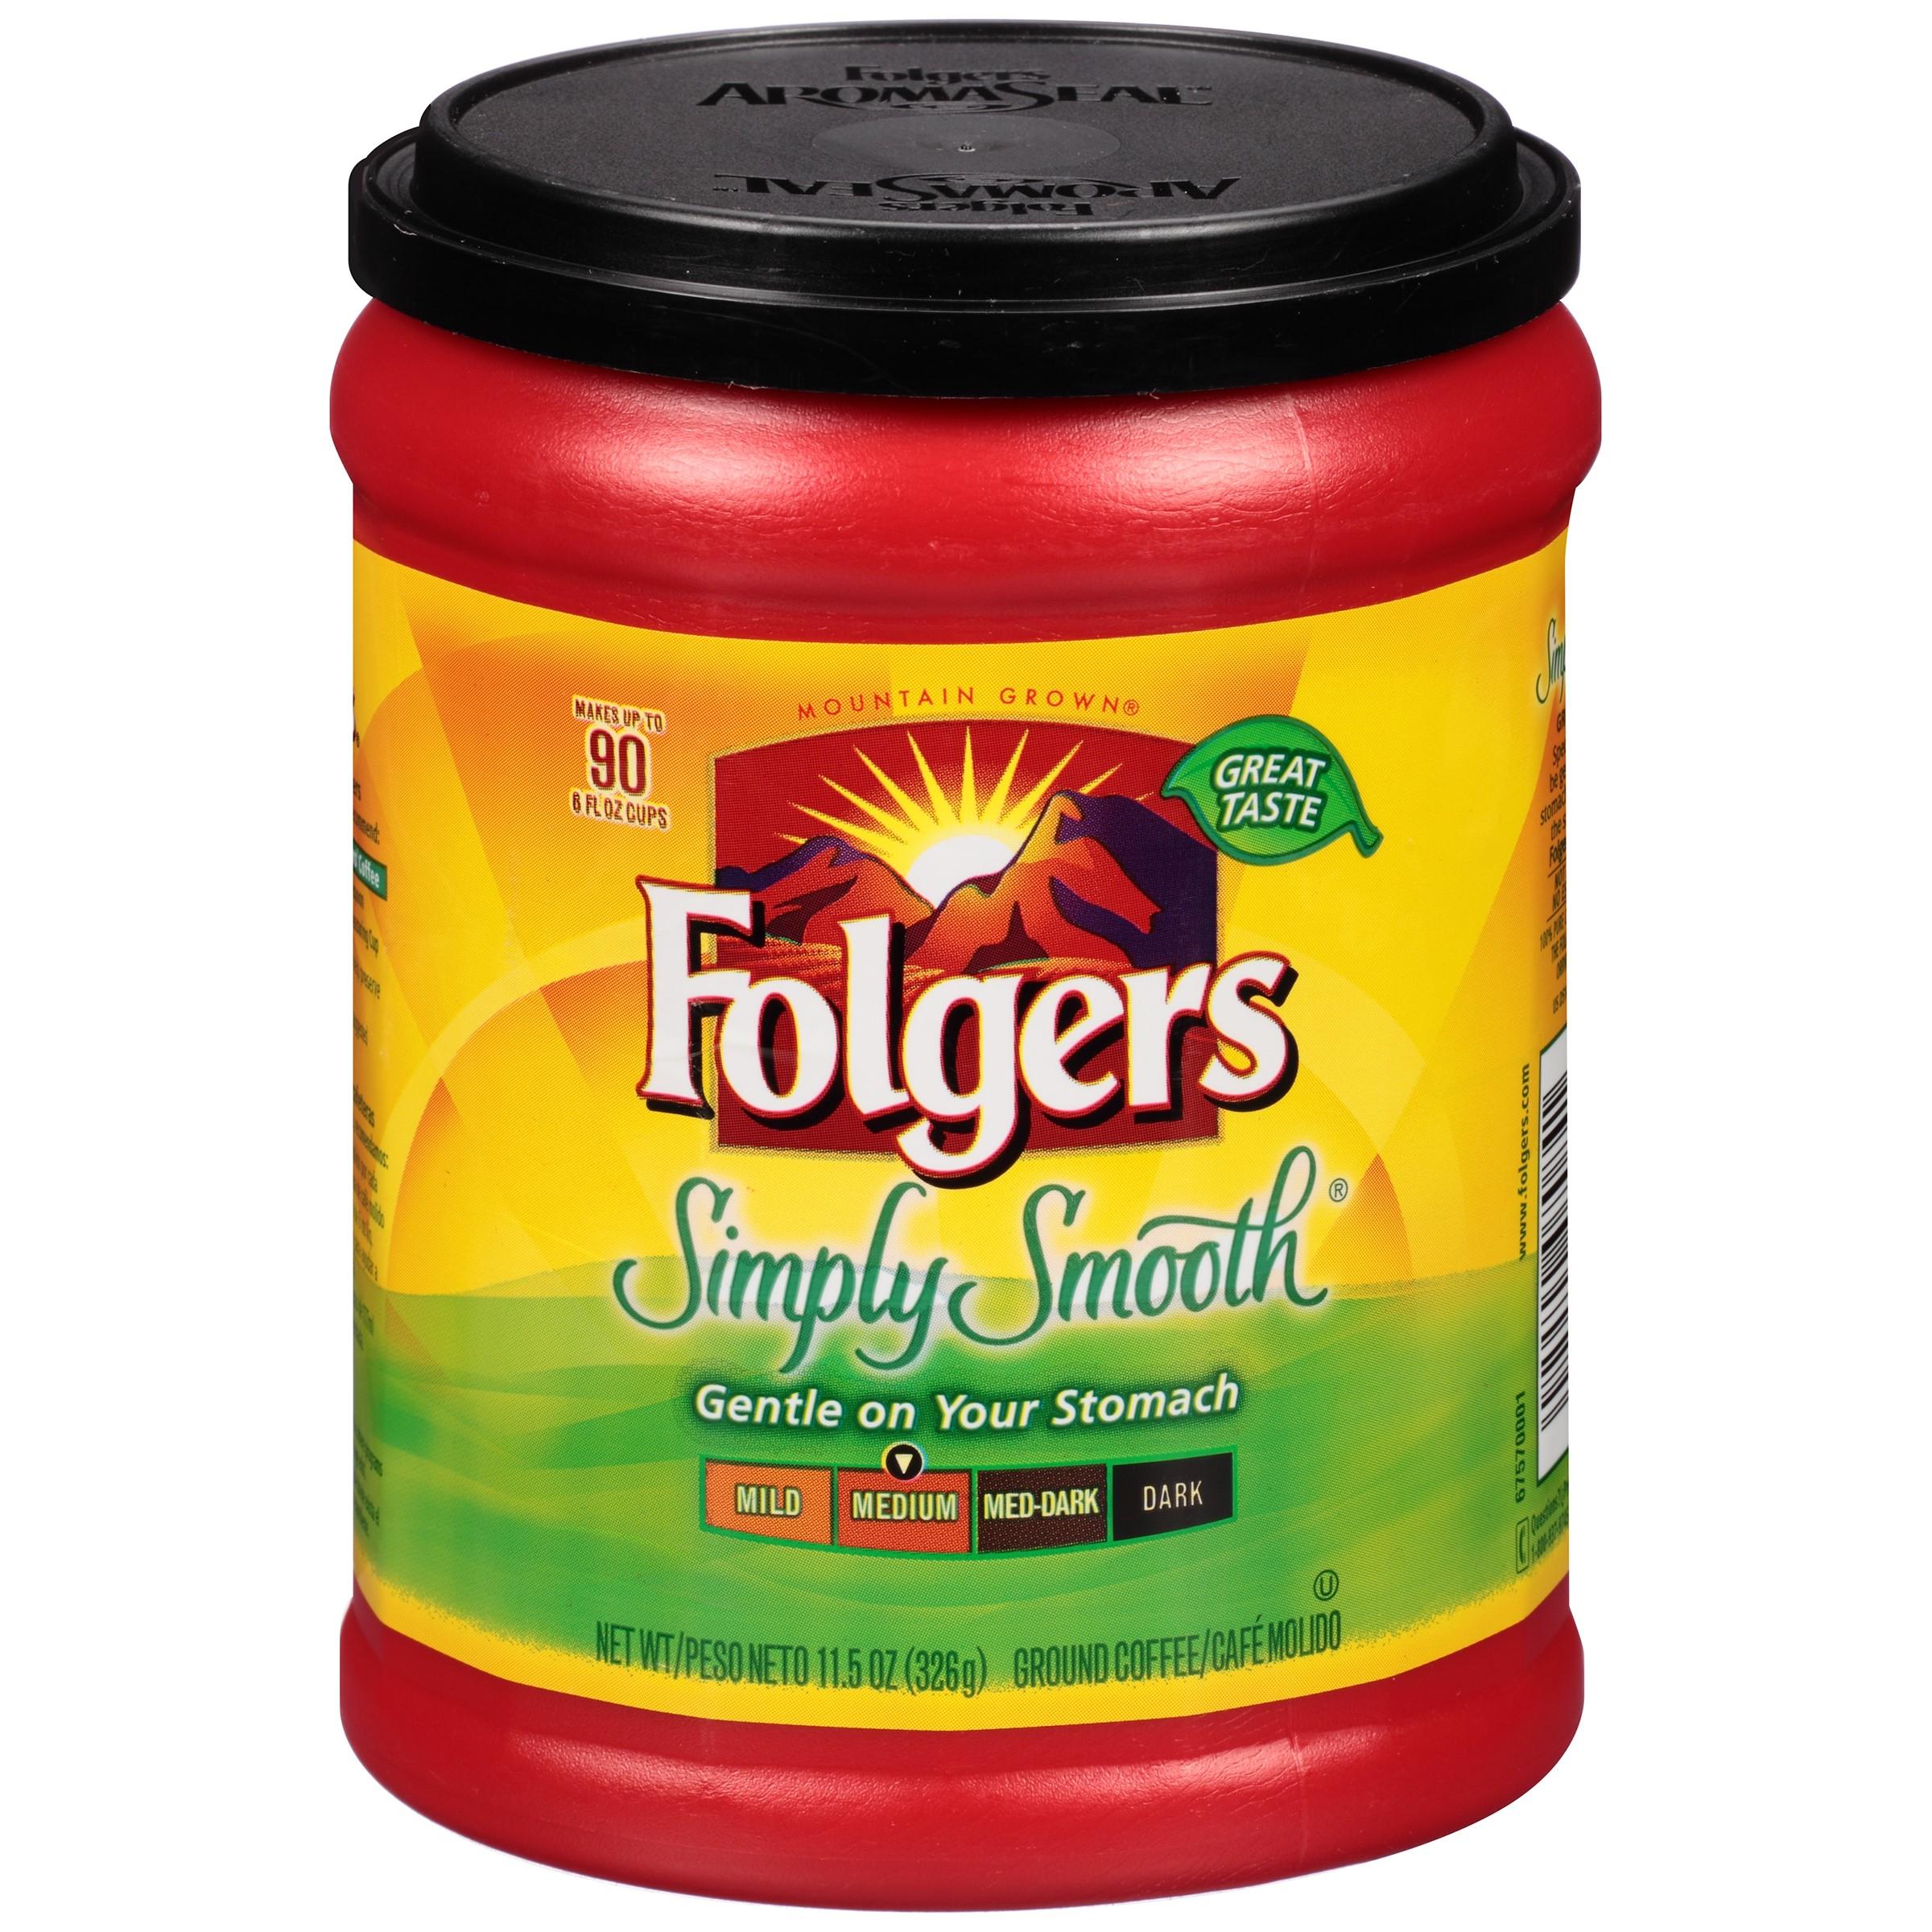 Folgers Medium Roast Ground Coffee, Simply Smooth, 11.5 Oz